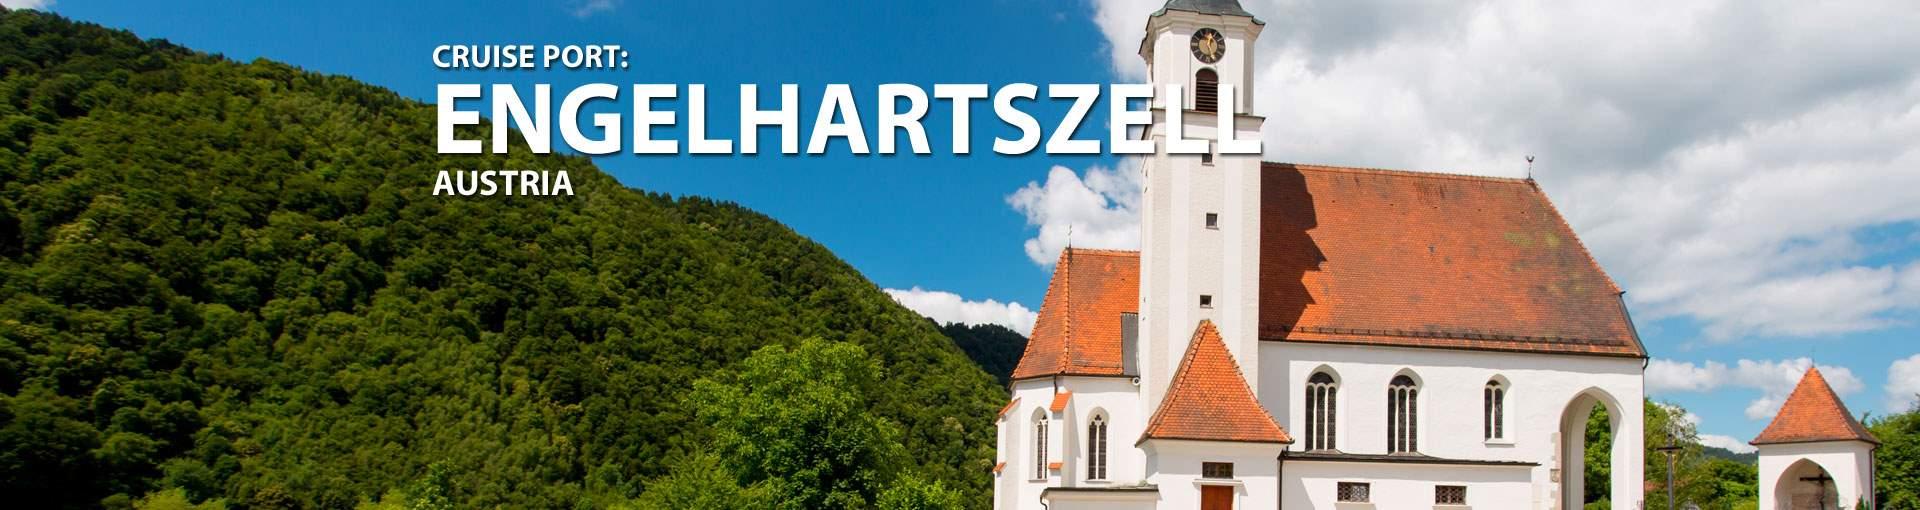 Cruises to Engelhartszell, Austria